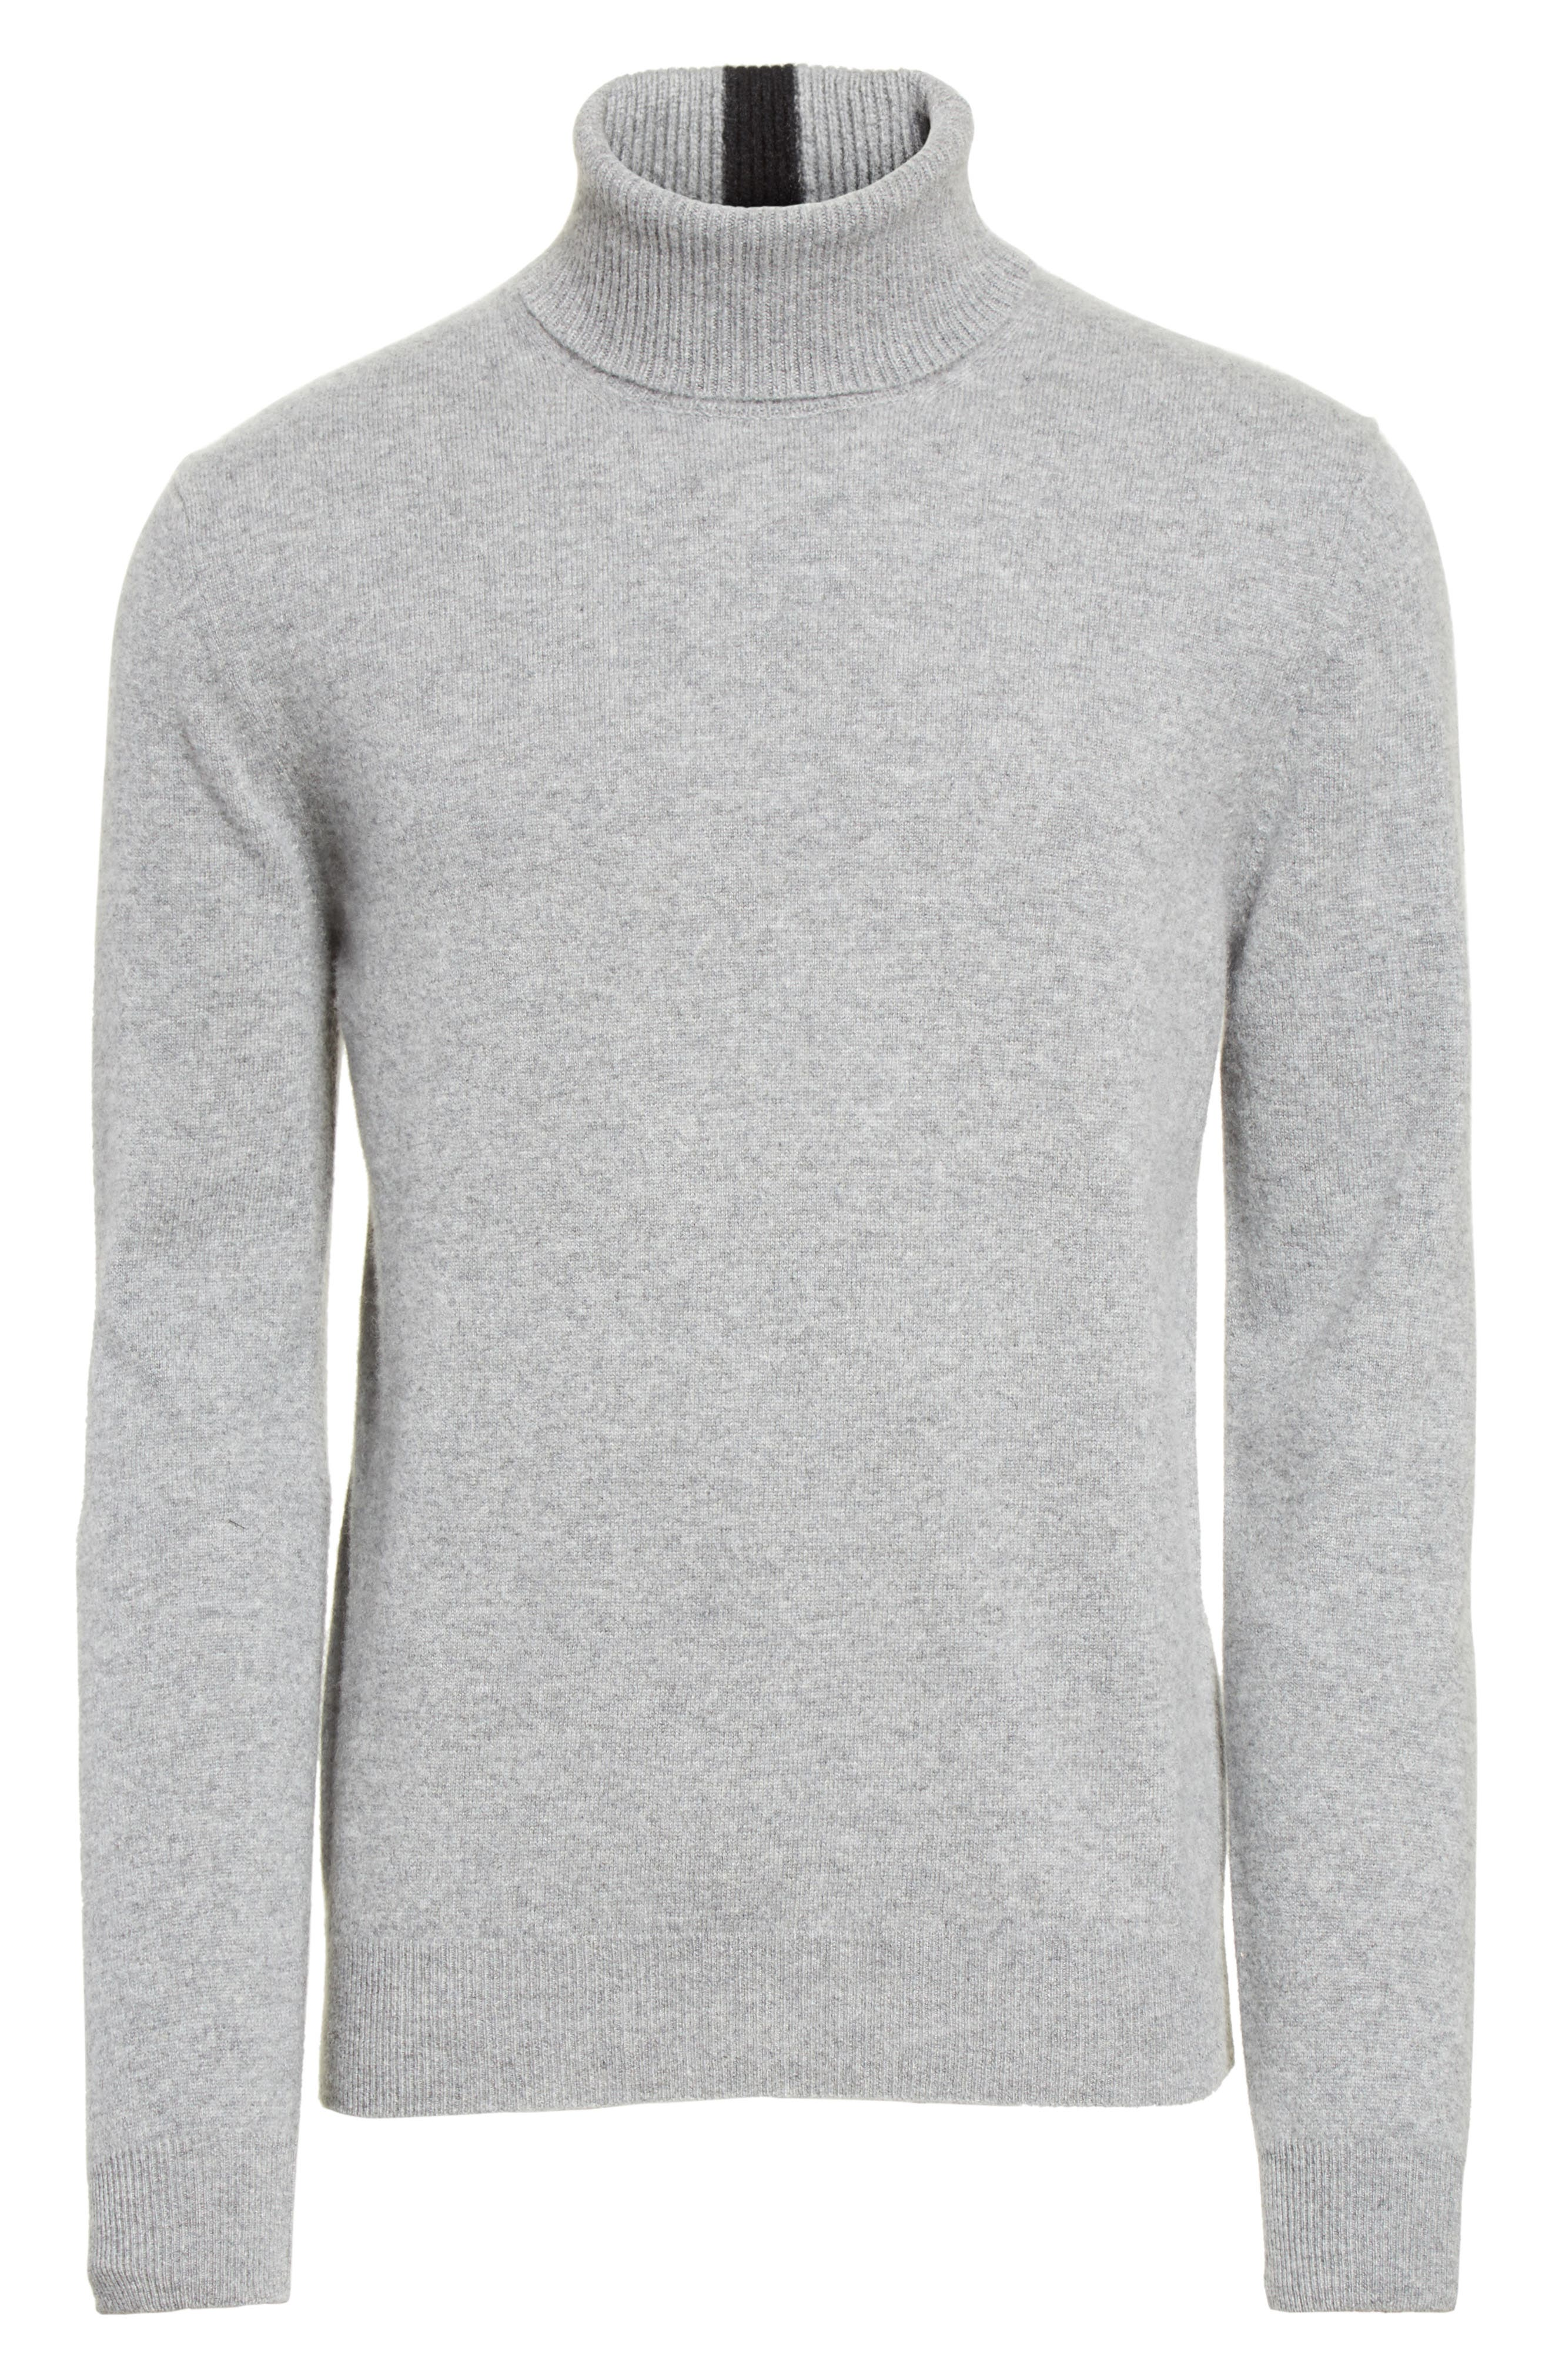 Turtleneck Sweater,                             Alternate thumbnail 6, color,                             Grey